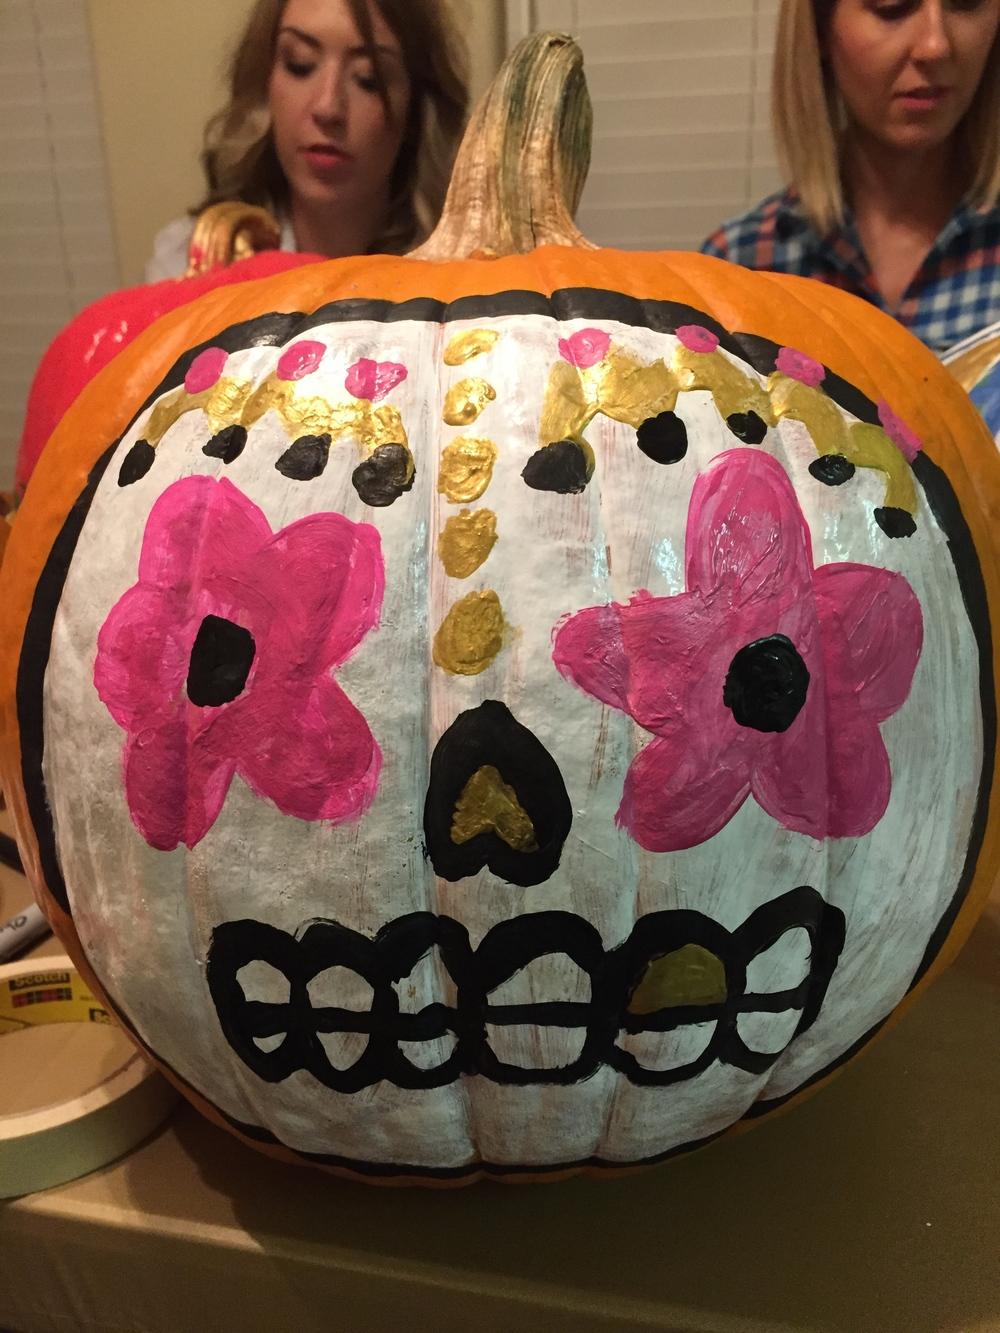 Anne's dias de los muertos pumpkin is the perfect combination of spooky and trendy.